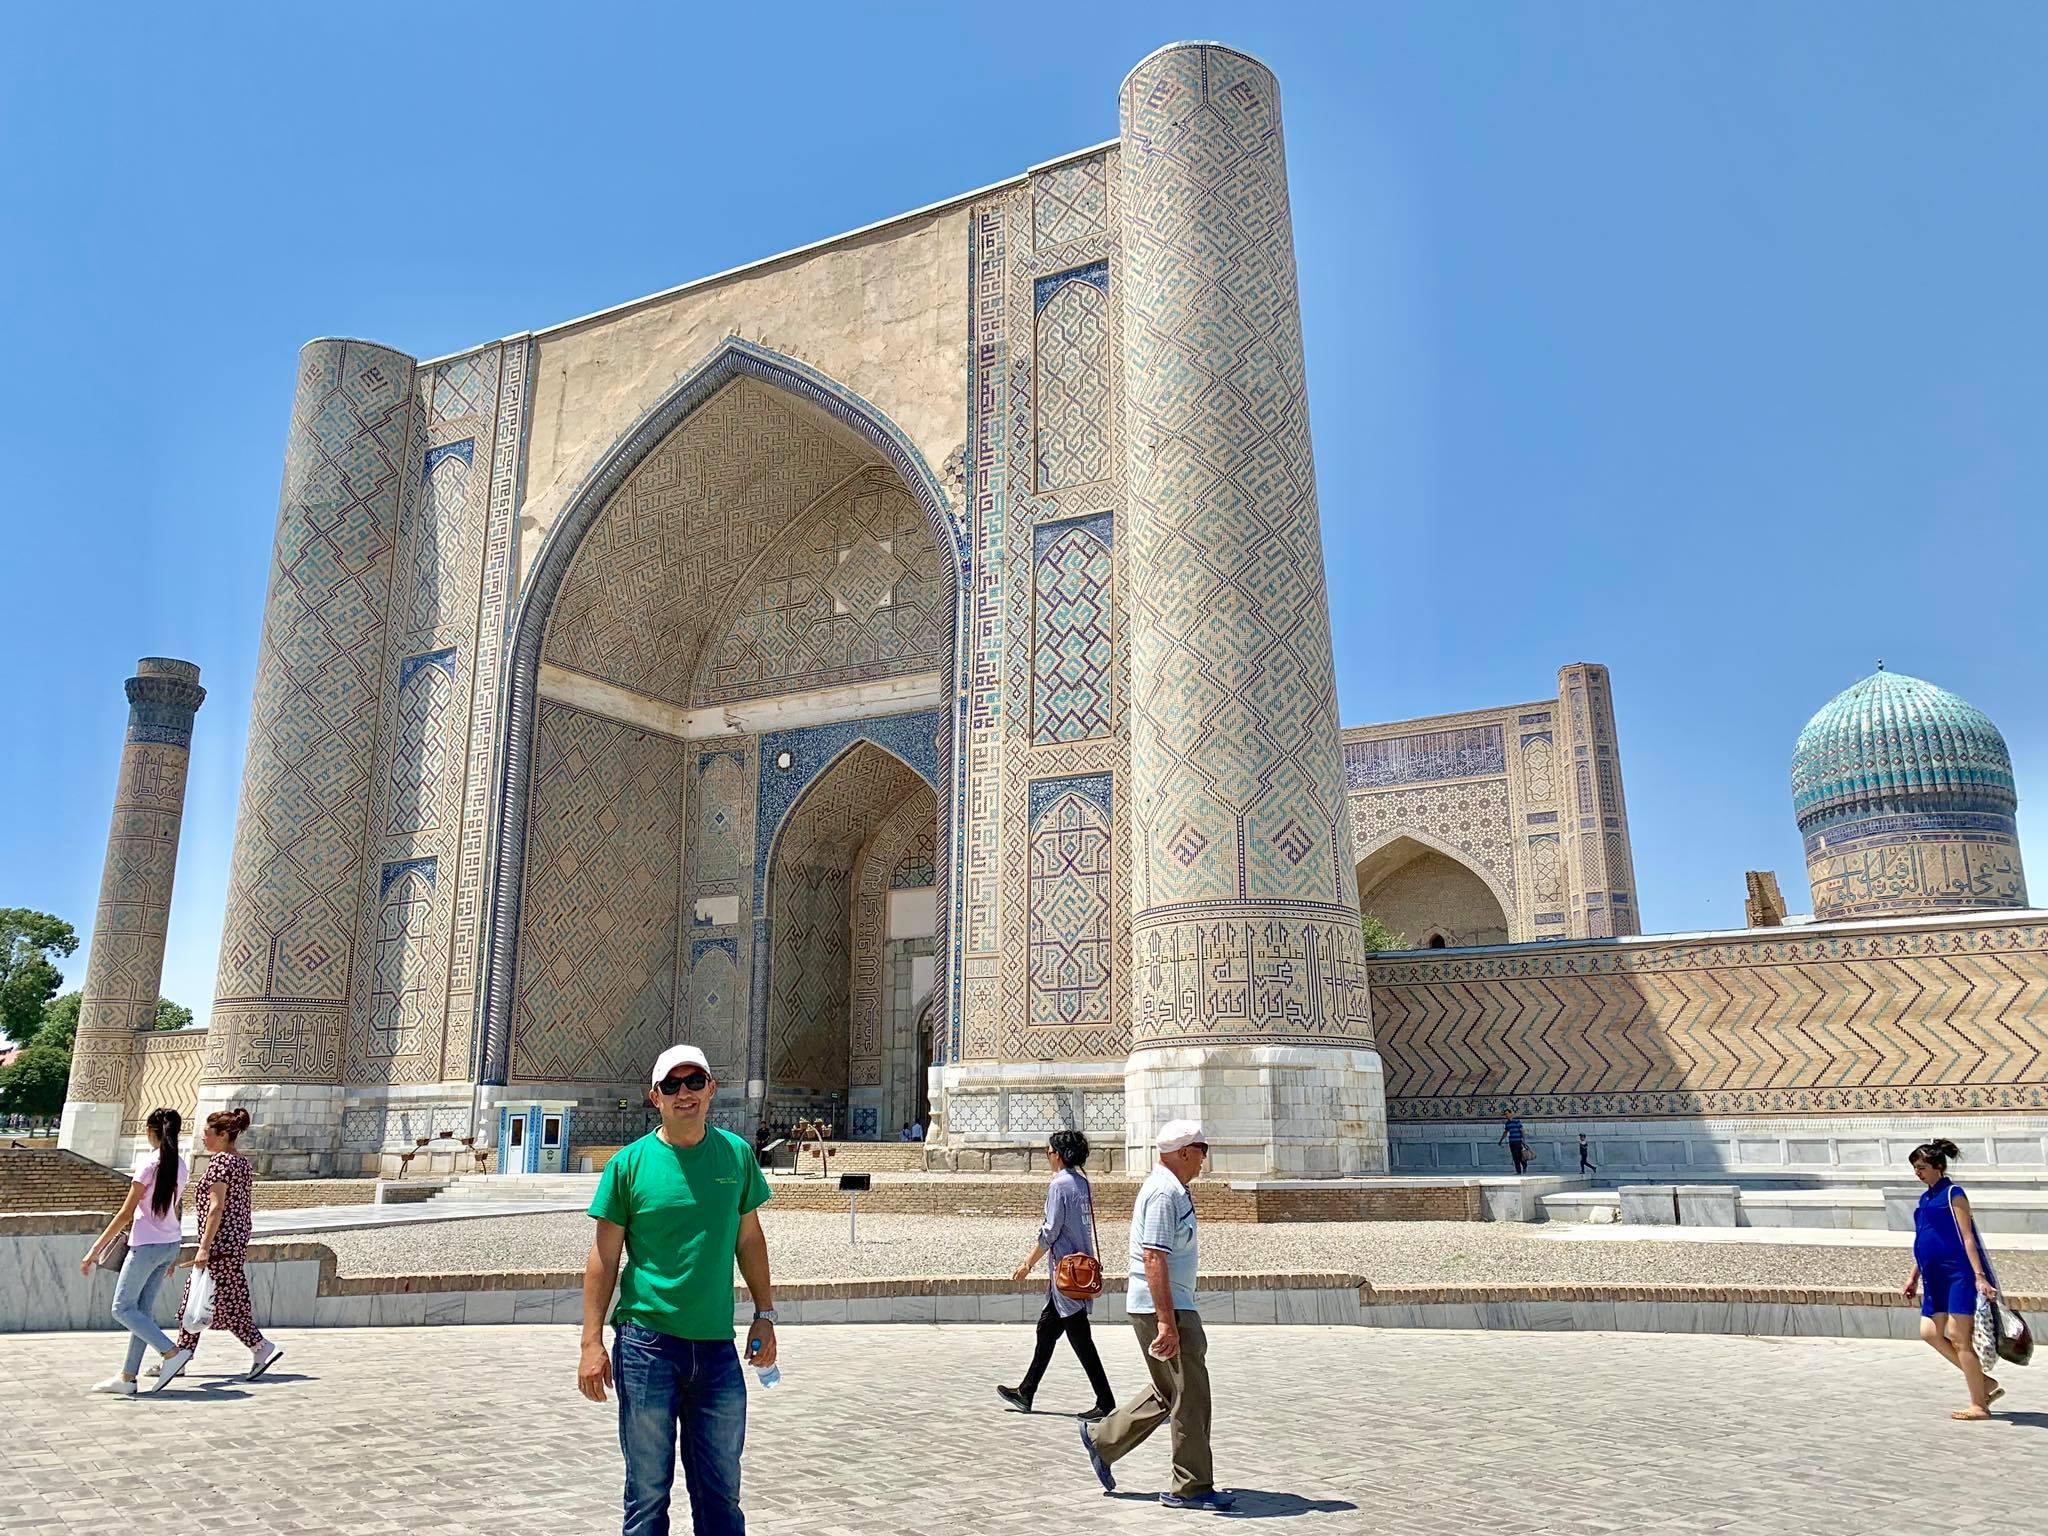 Kach Solo Travels in 2019 Siyab Bazaar and Registan on my first day in Samarkand9.jpg